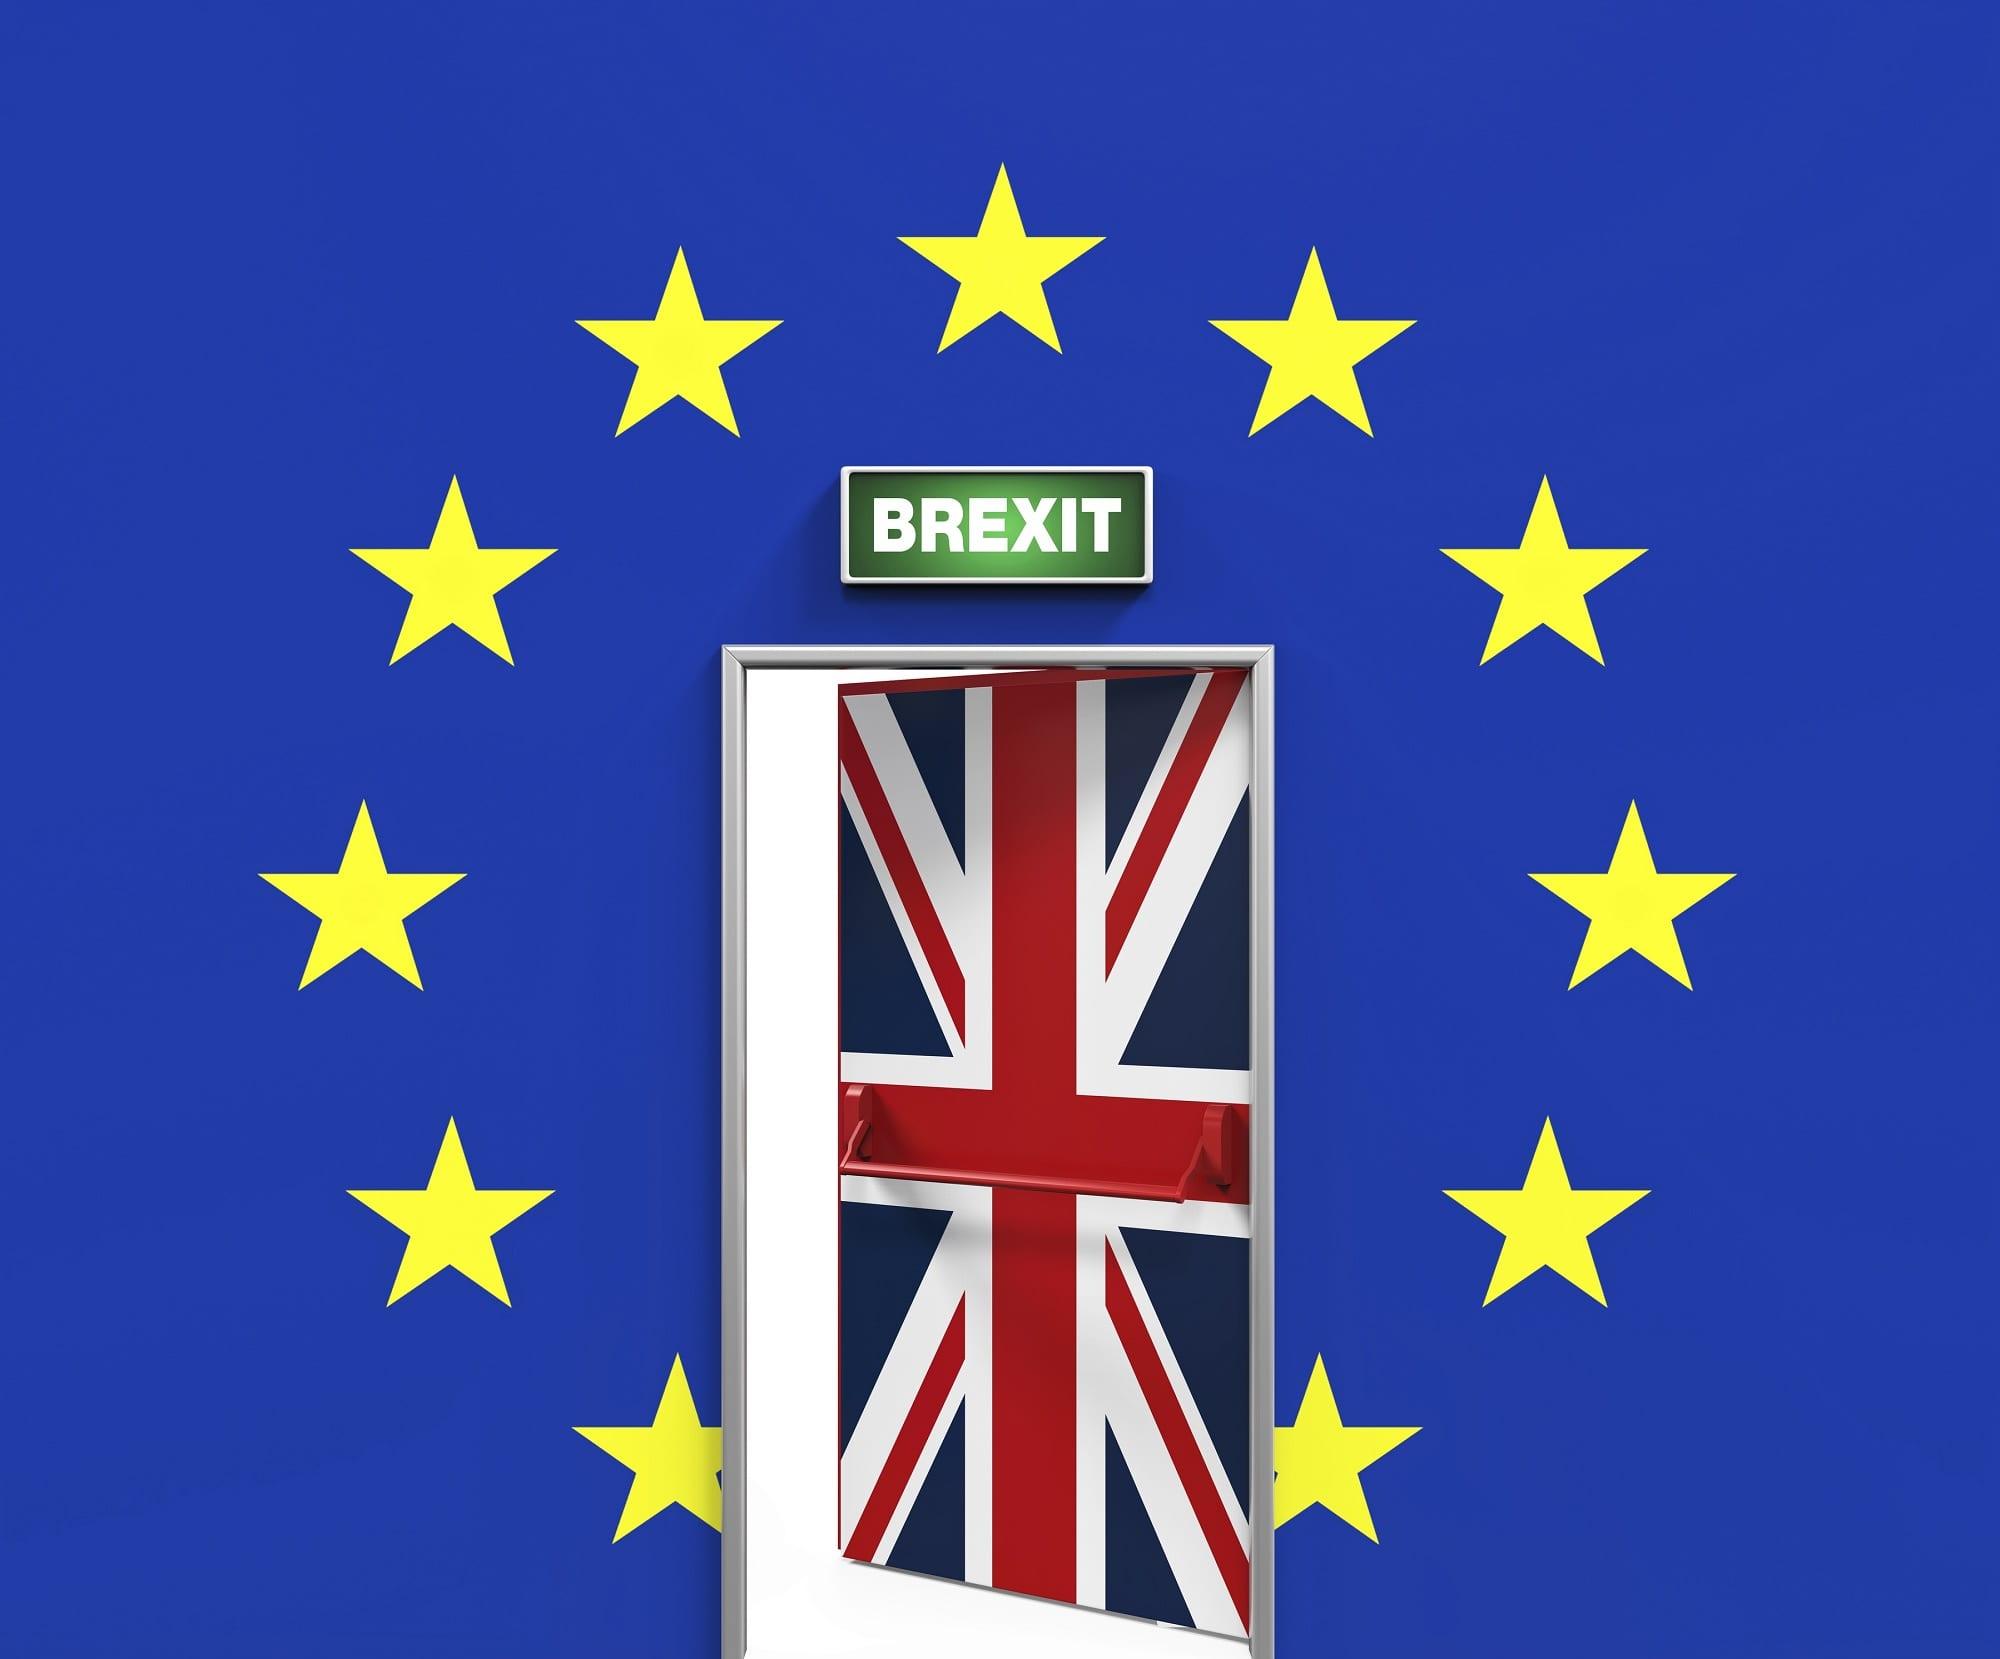 Brexi